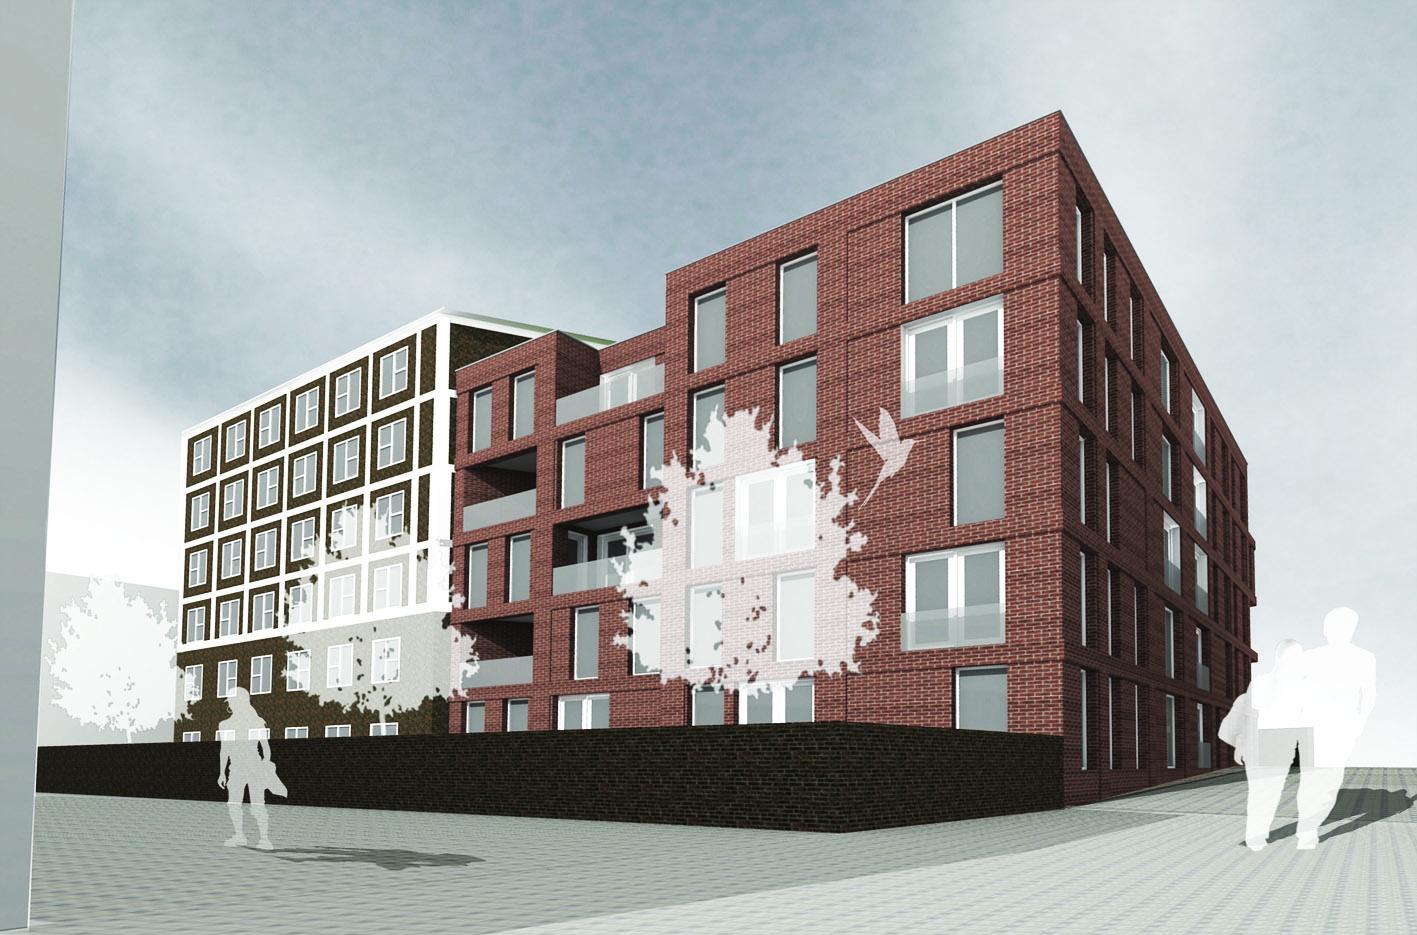 Brikkenhof Sphinx Maastricht Europan10 atelier PUUUR 3D